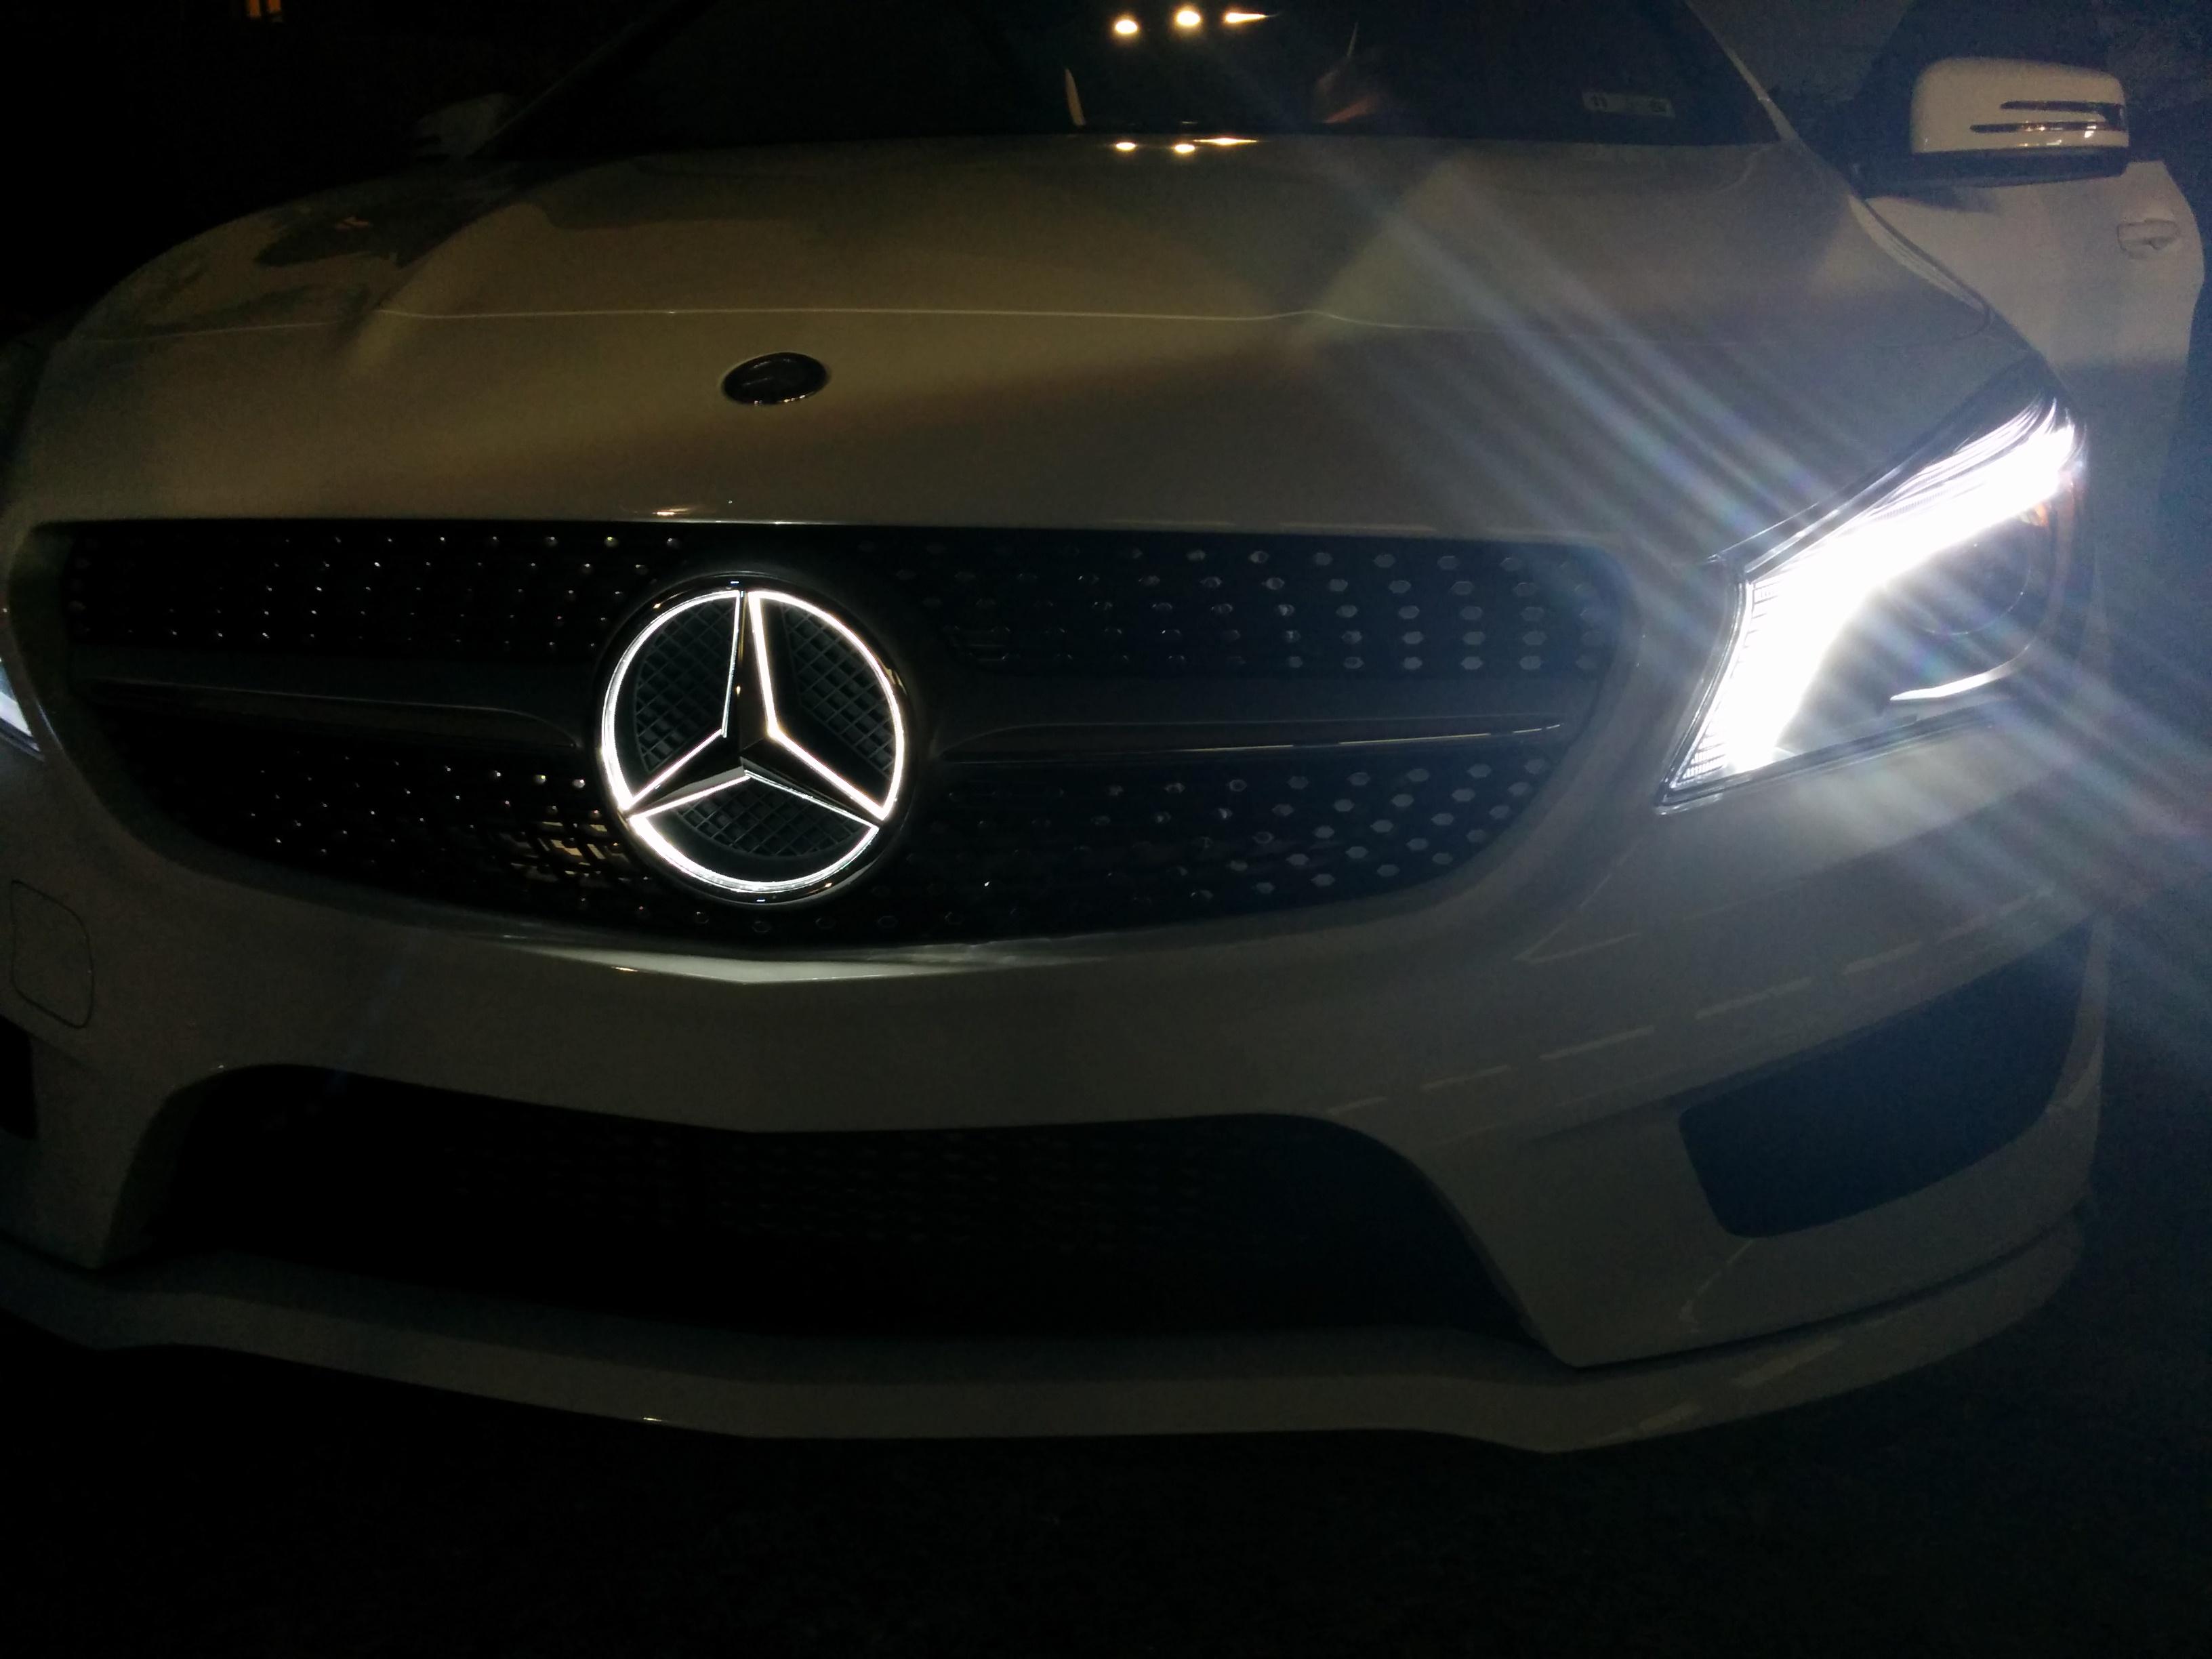 illuminated mb star - mbworld forums